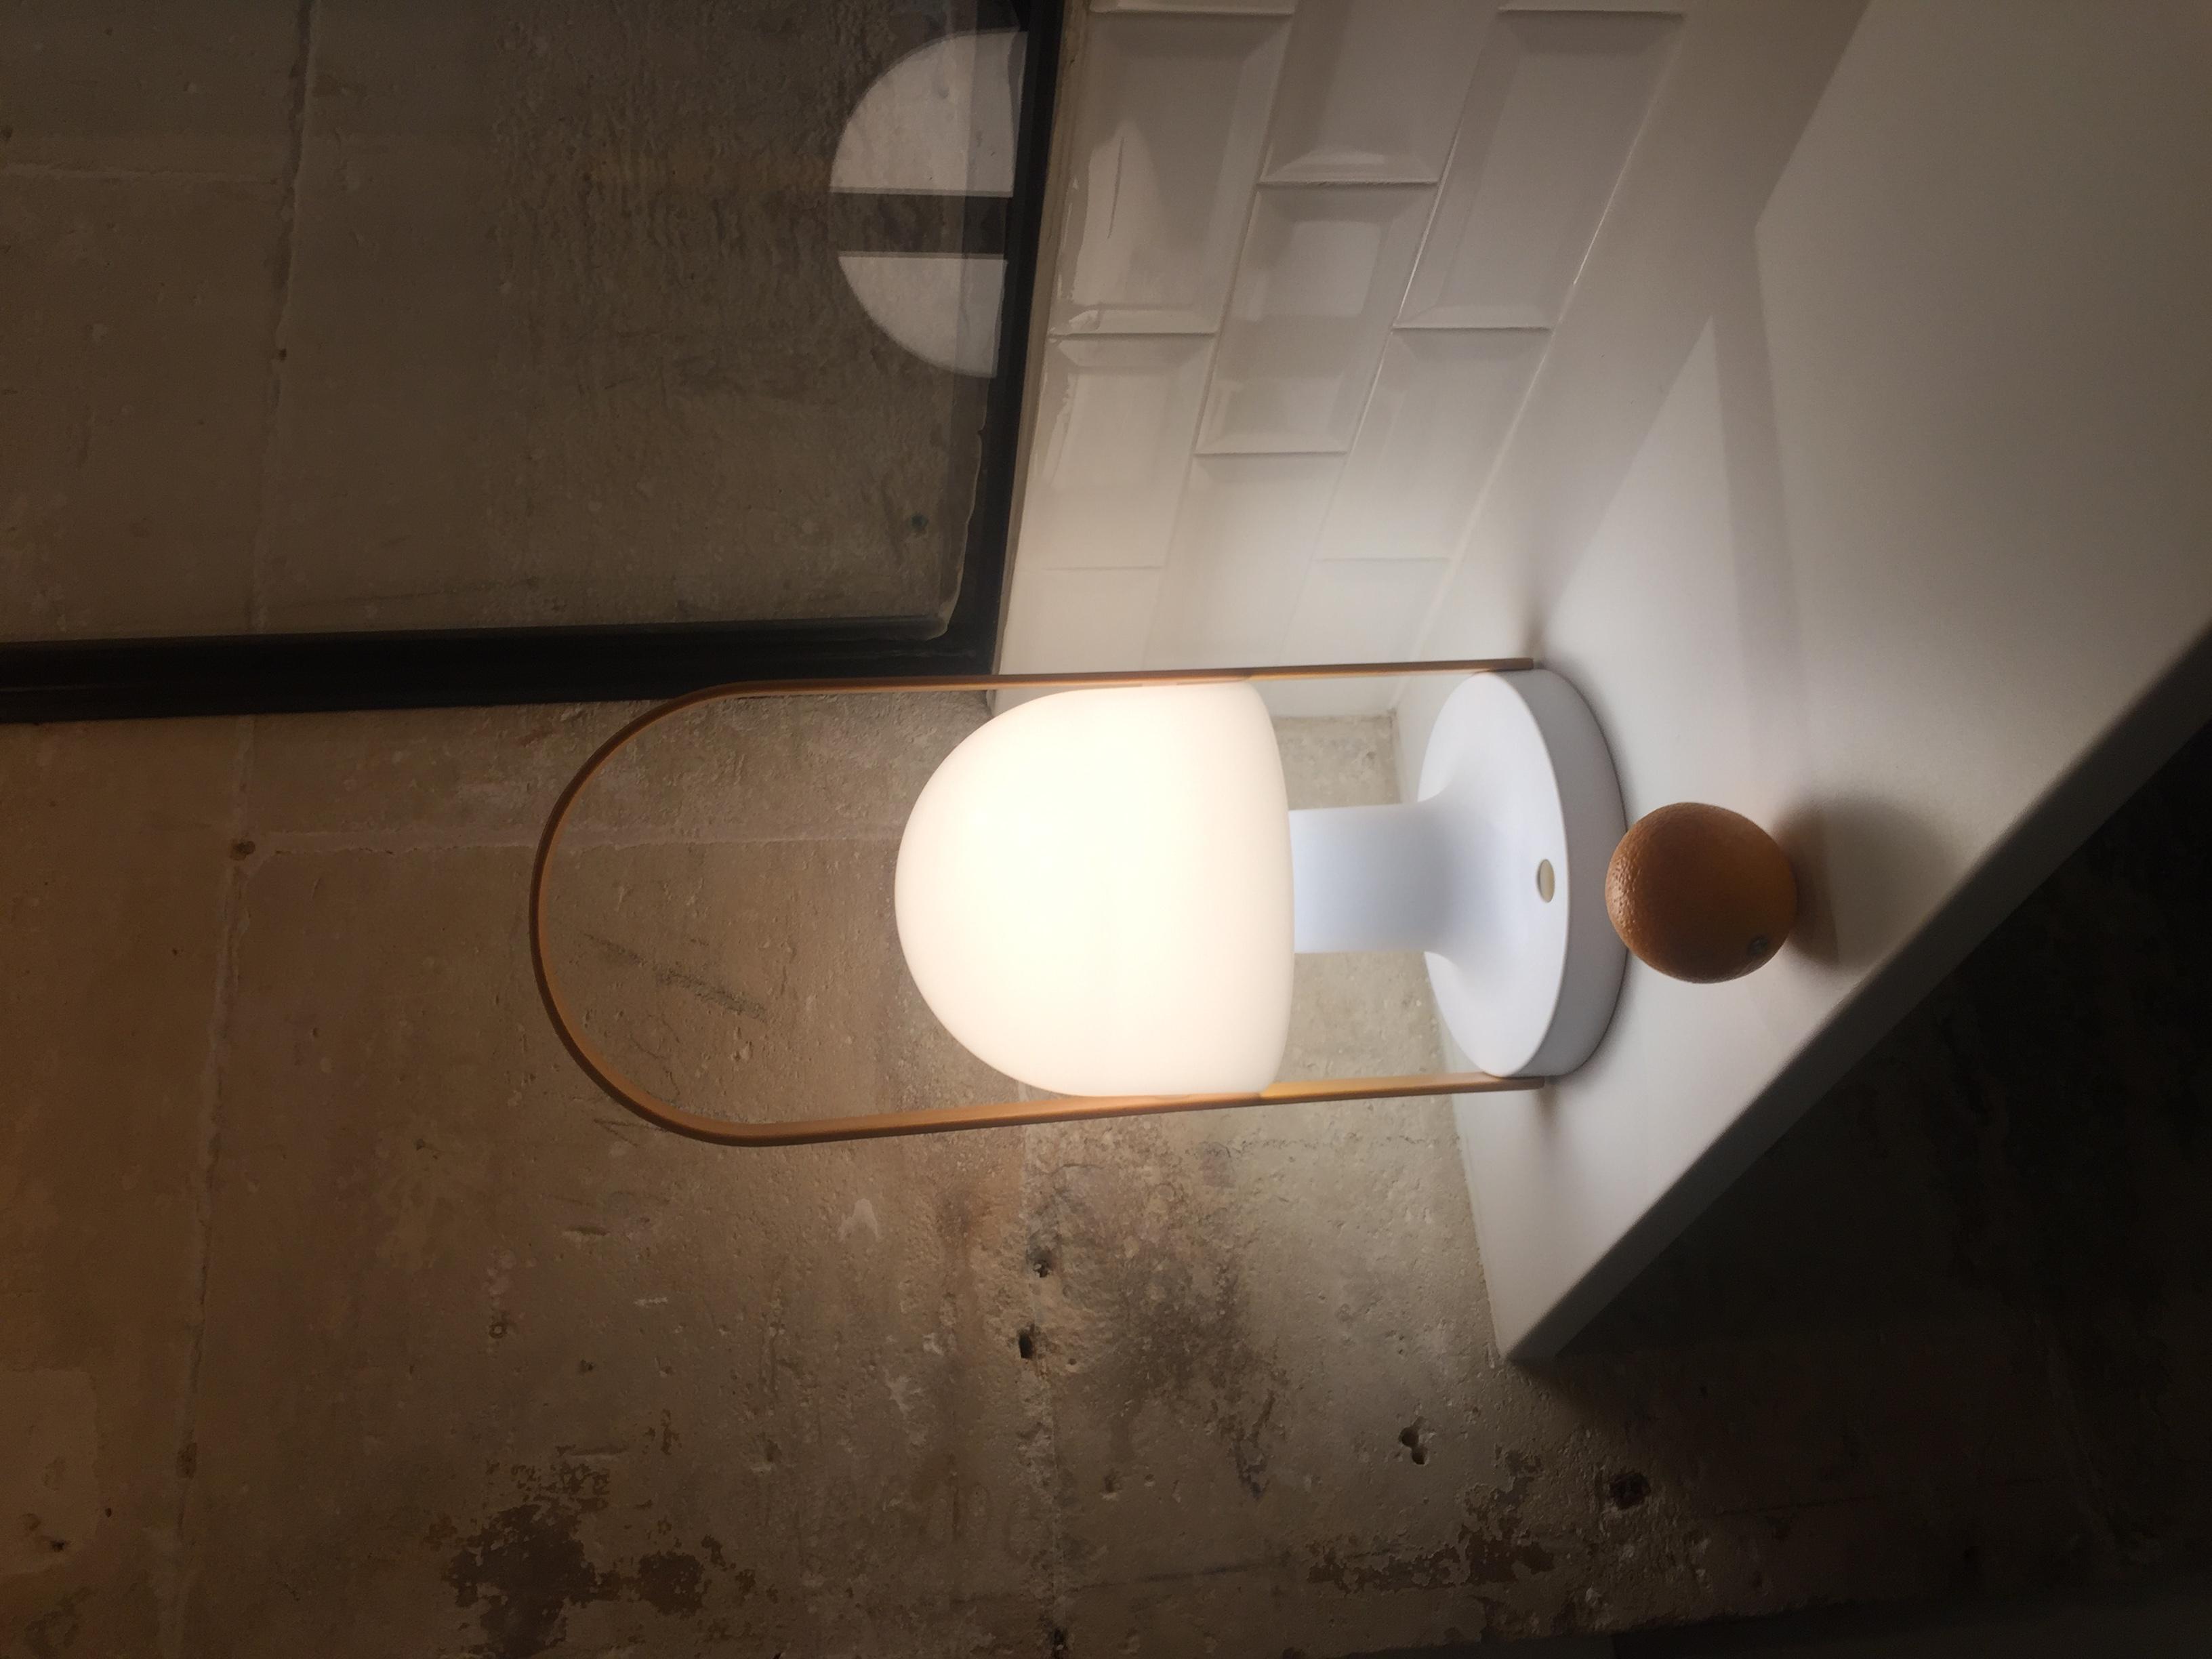 baladeuse follow me plus blanc led dimmable h44 3cm 18 5cm marset luminaires nedgis. Black Bedroom Furniture Sets. Home Design Ideas